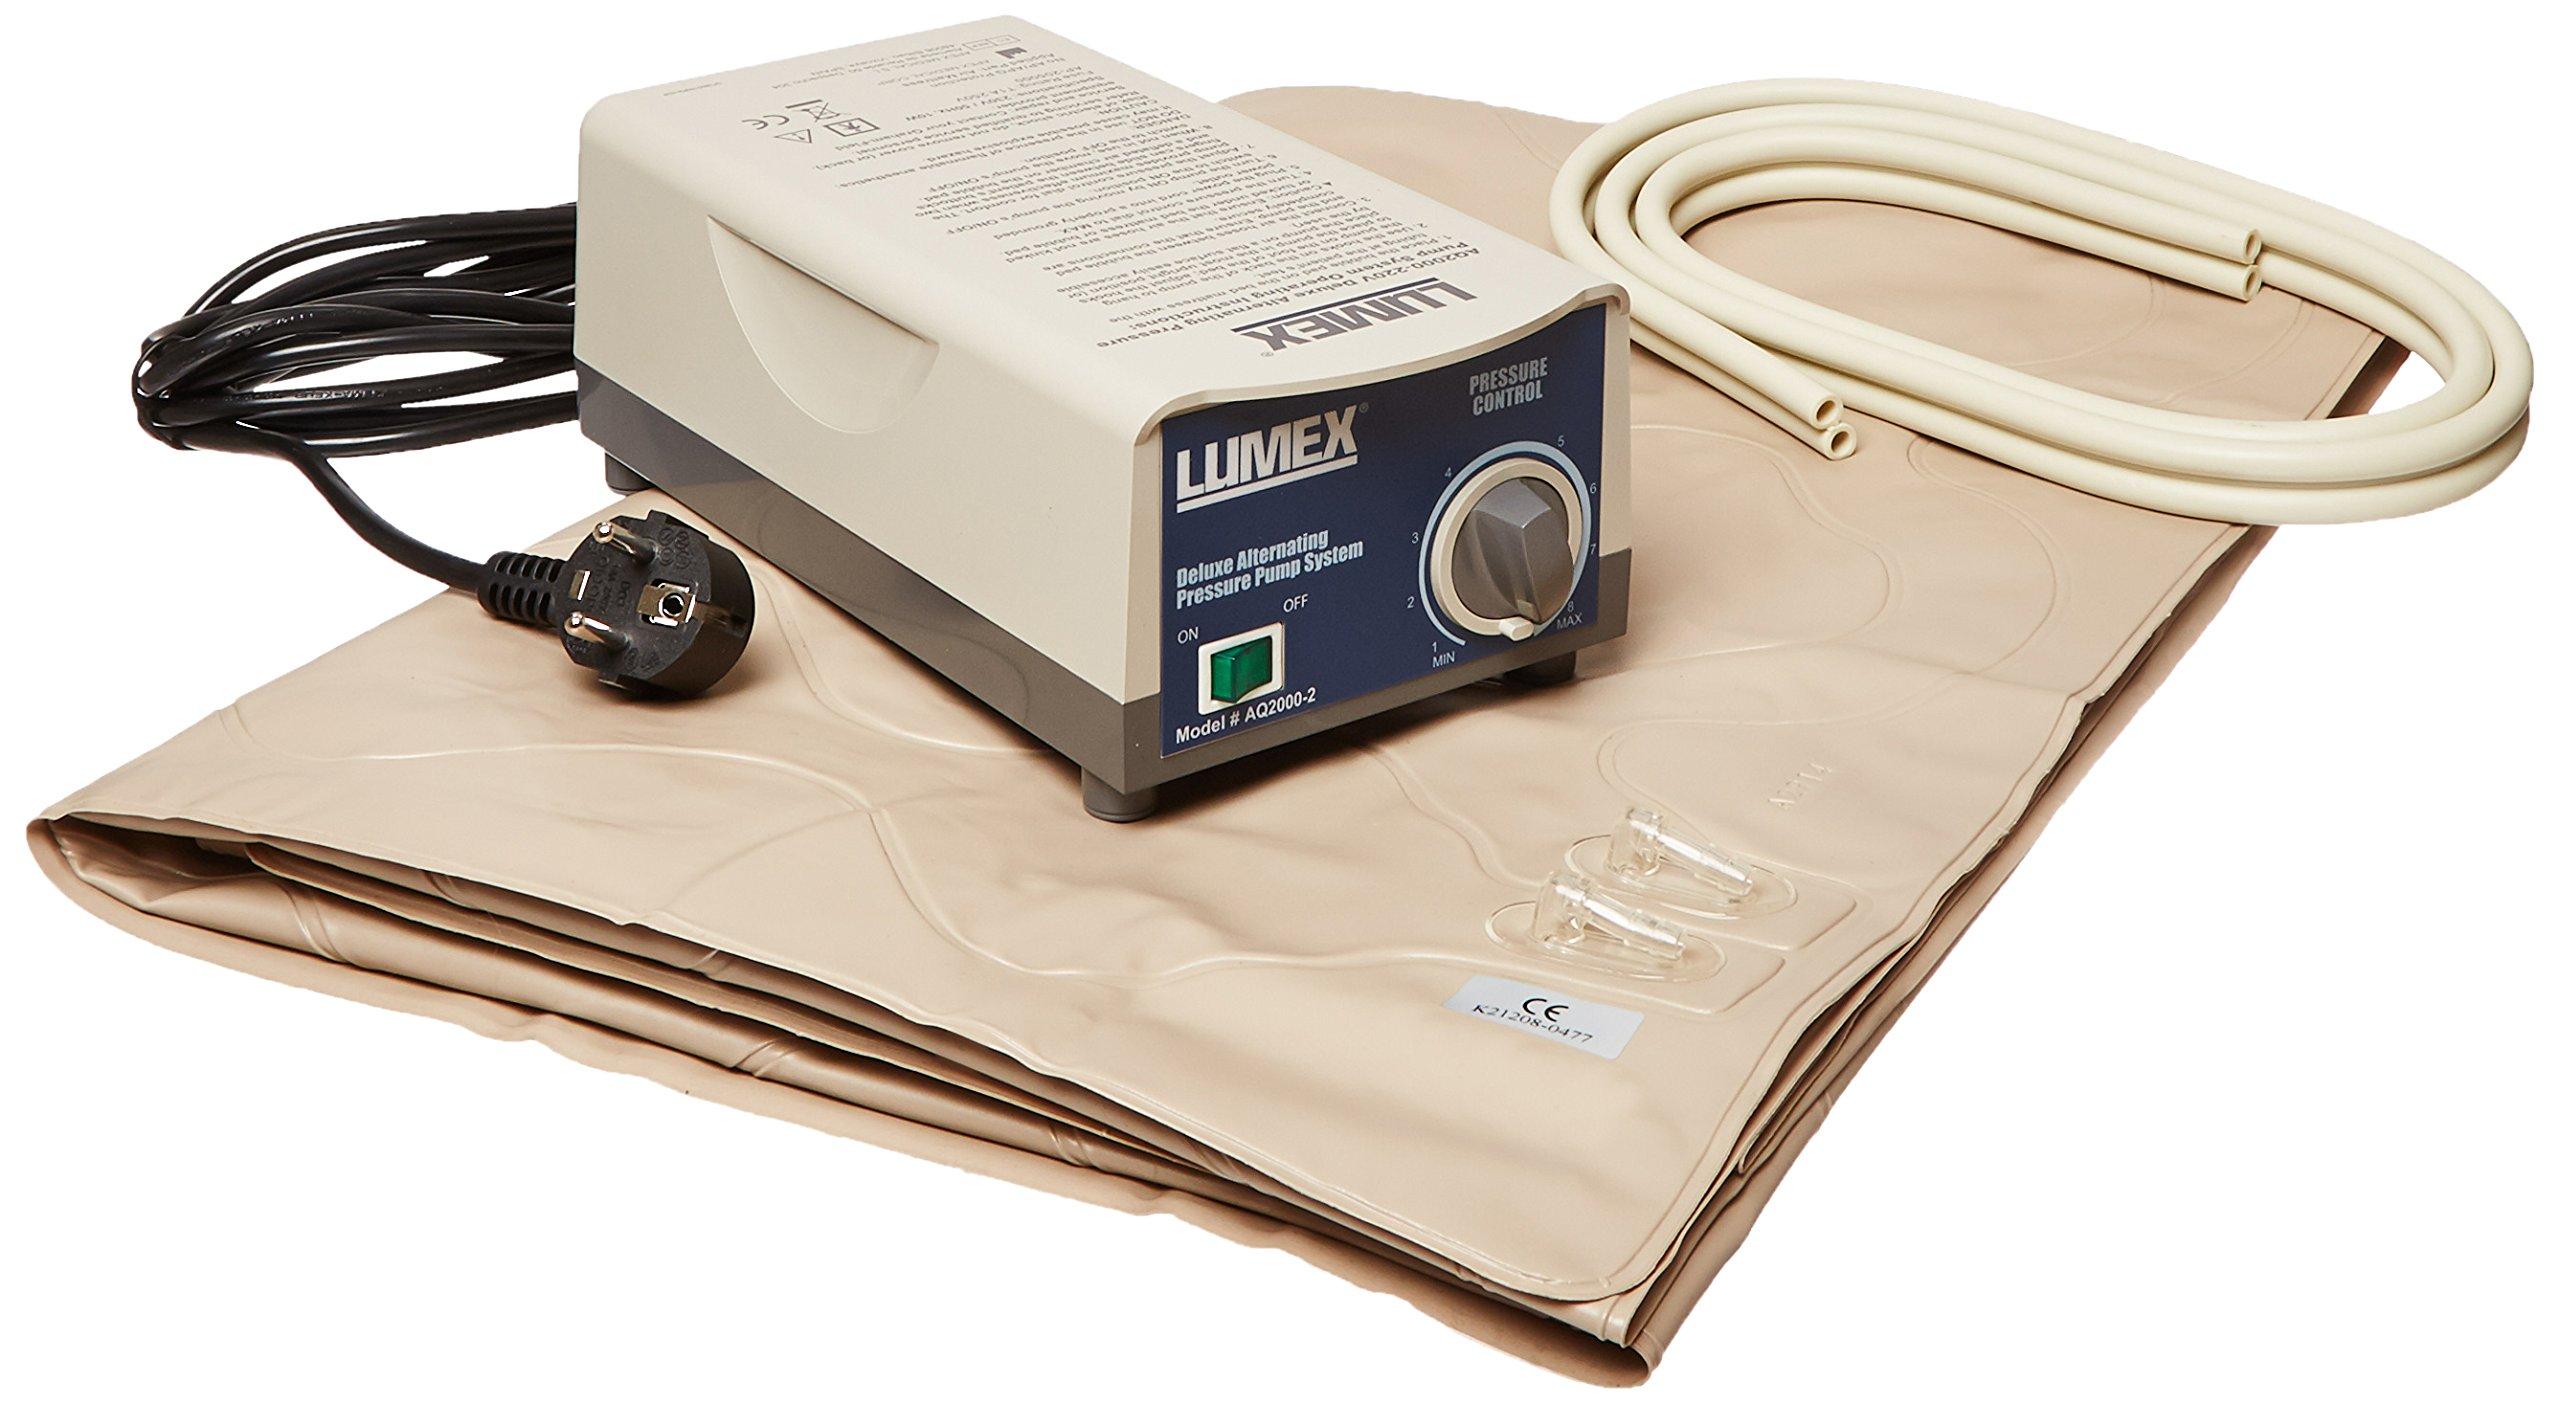 Lumex AQ2000-220V Alternating Pressure Pad Mattress and Pump System, 220V